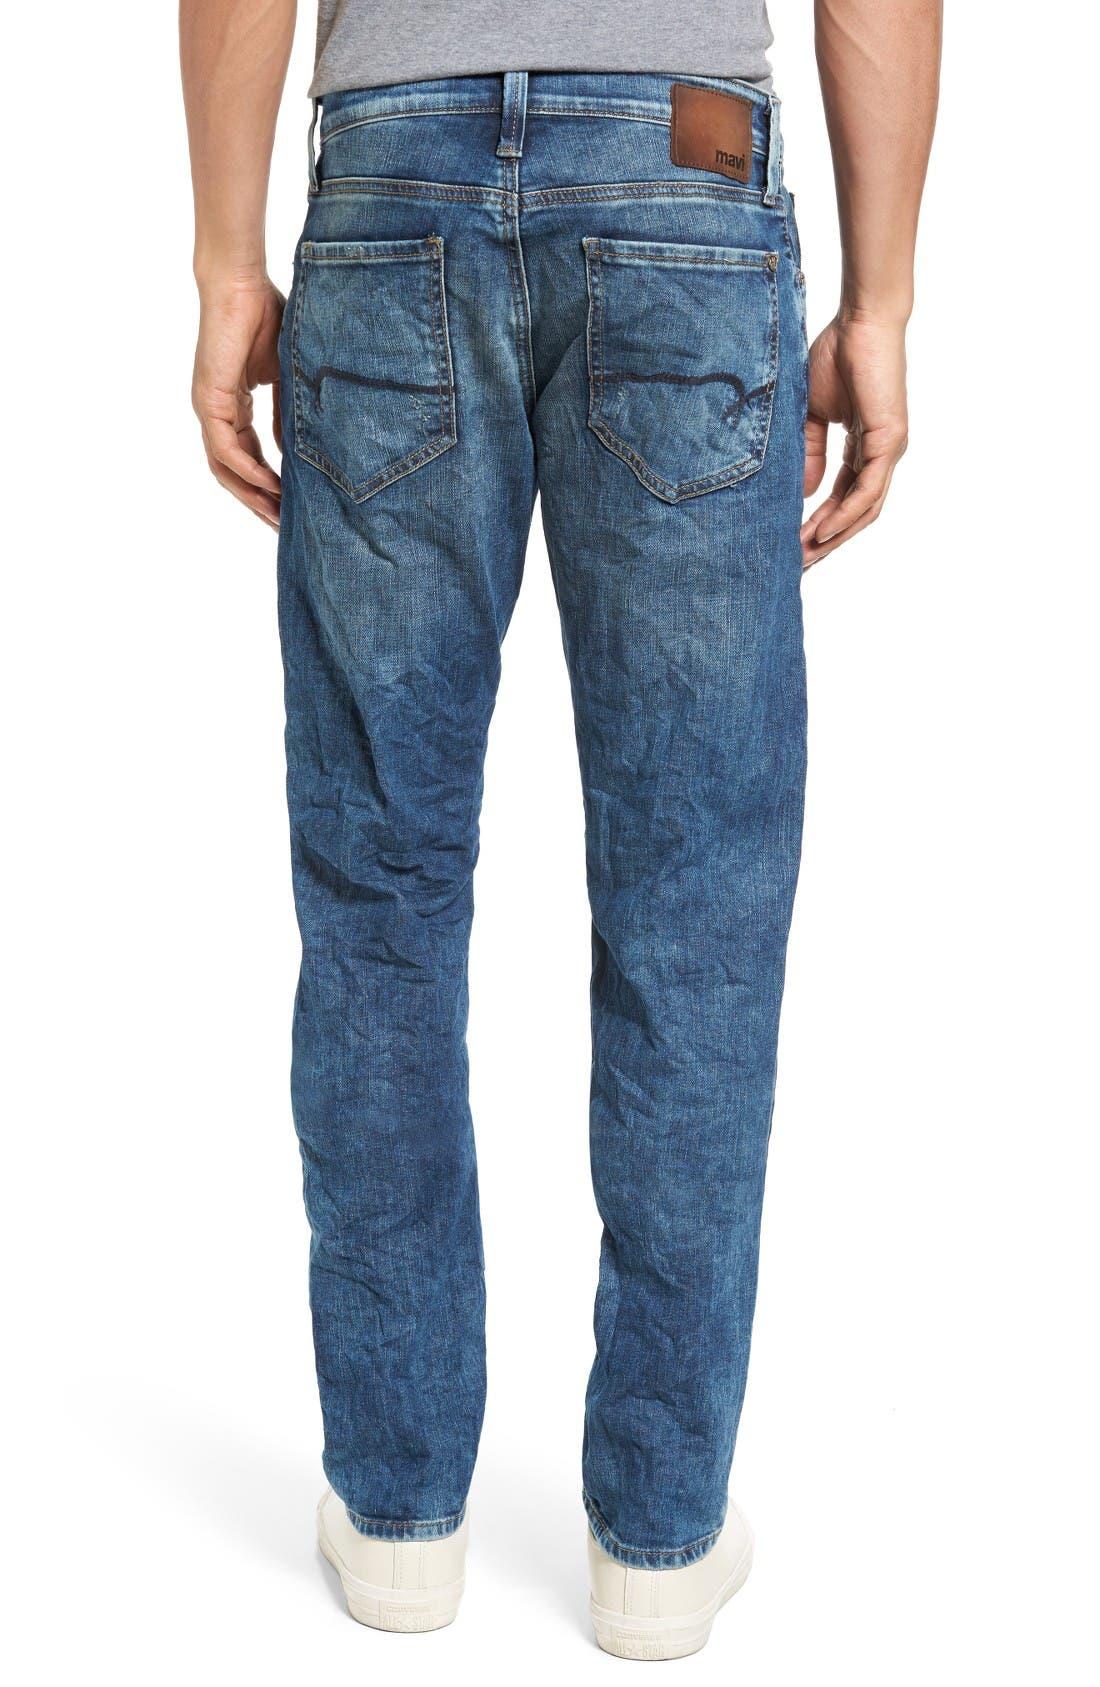 Jake Easy Slim Fit Jeans,                             Alternate thumbnail 2, color,                             Random Extreme Vintage